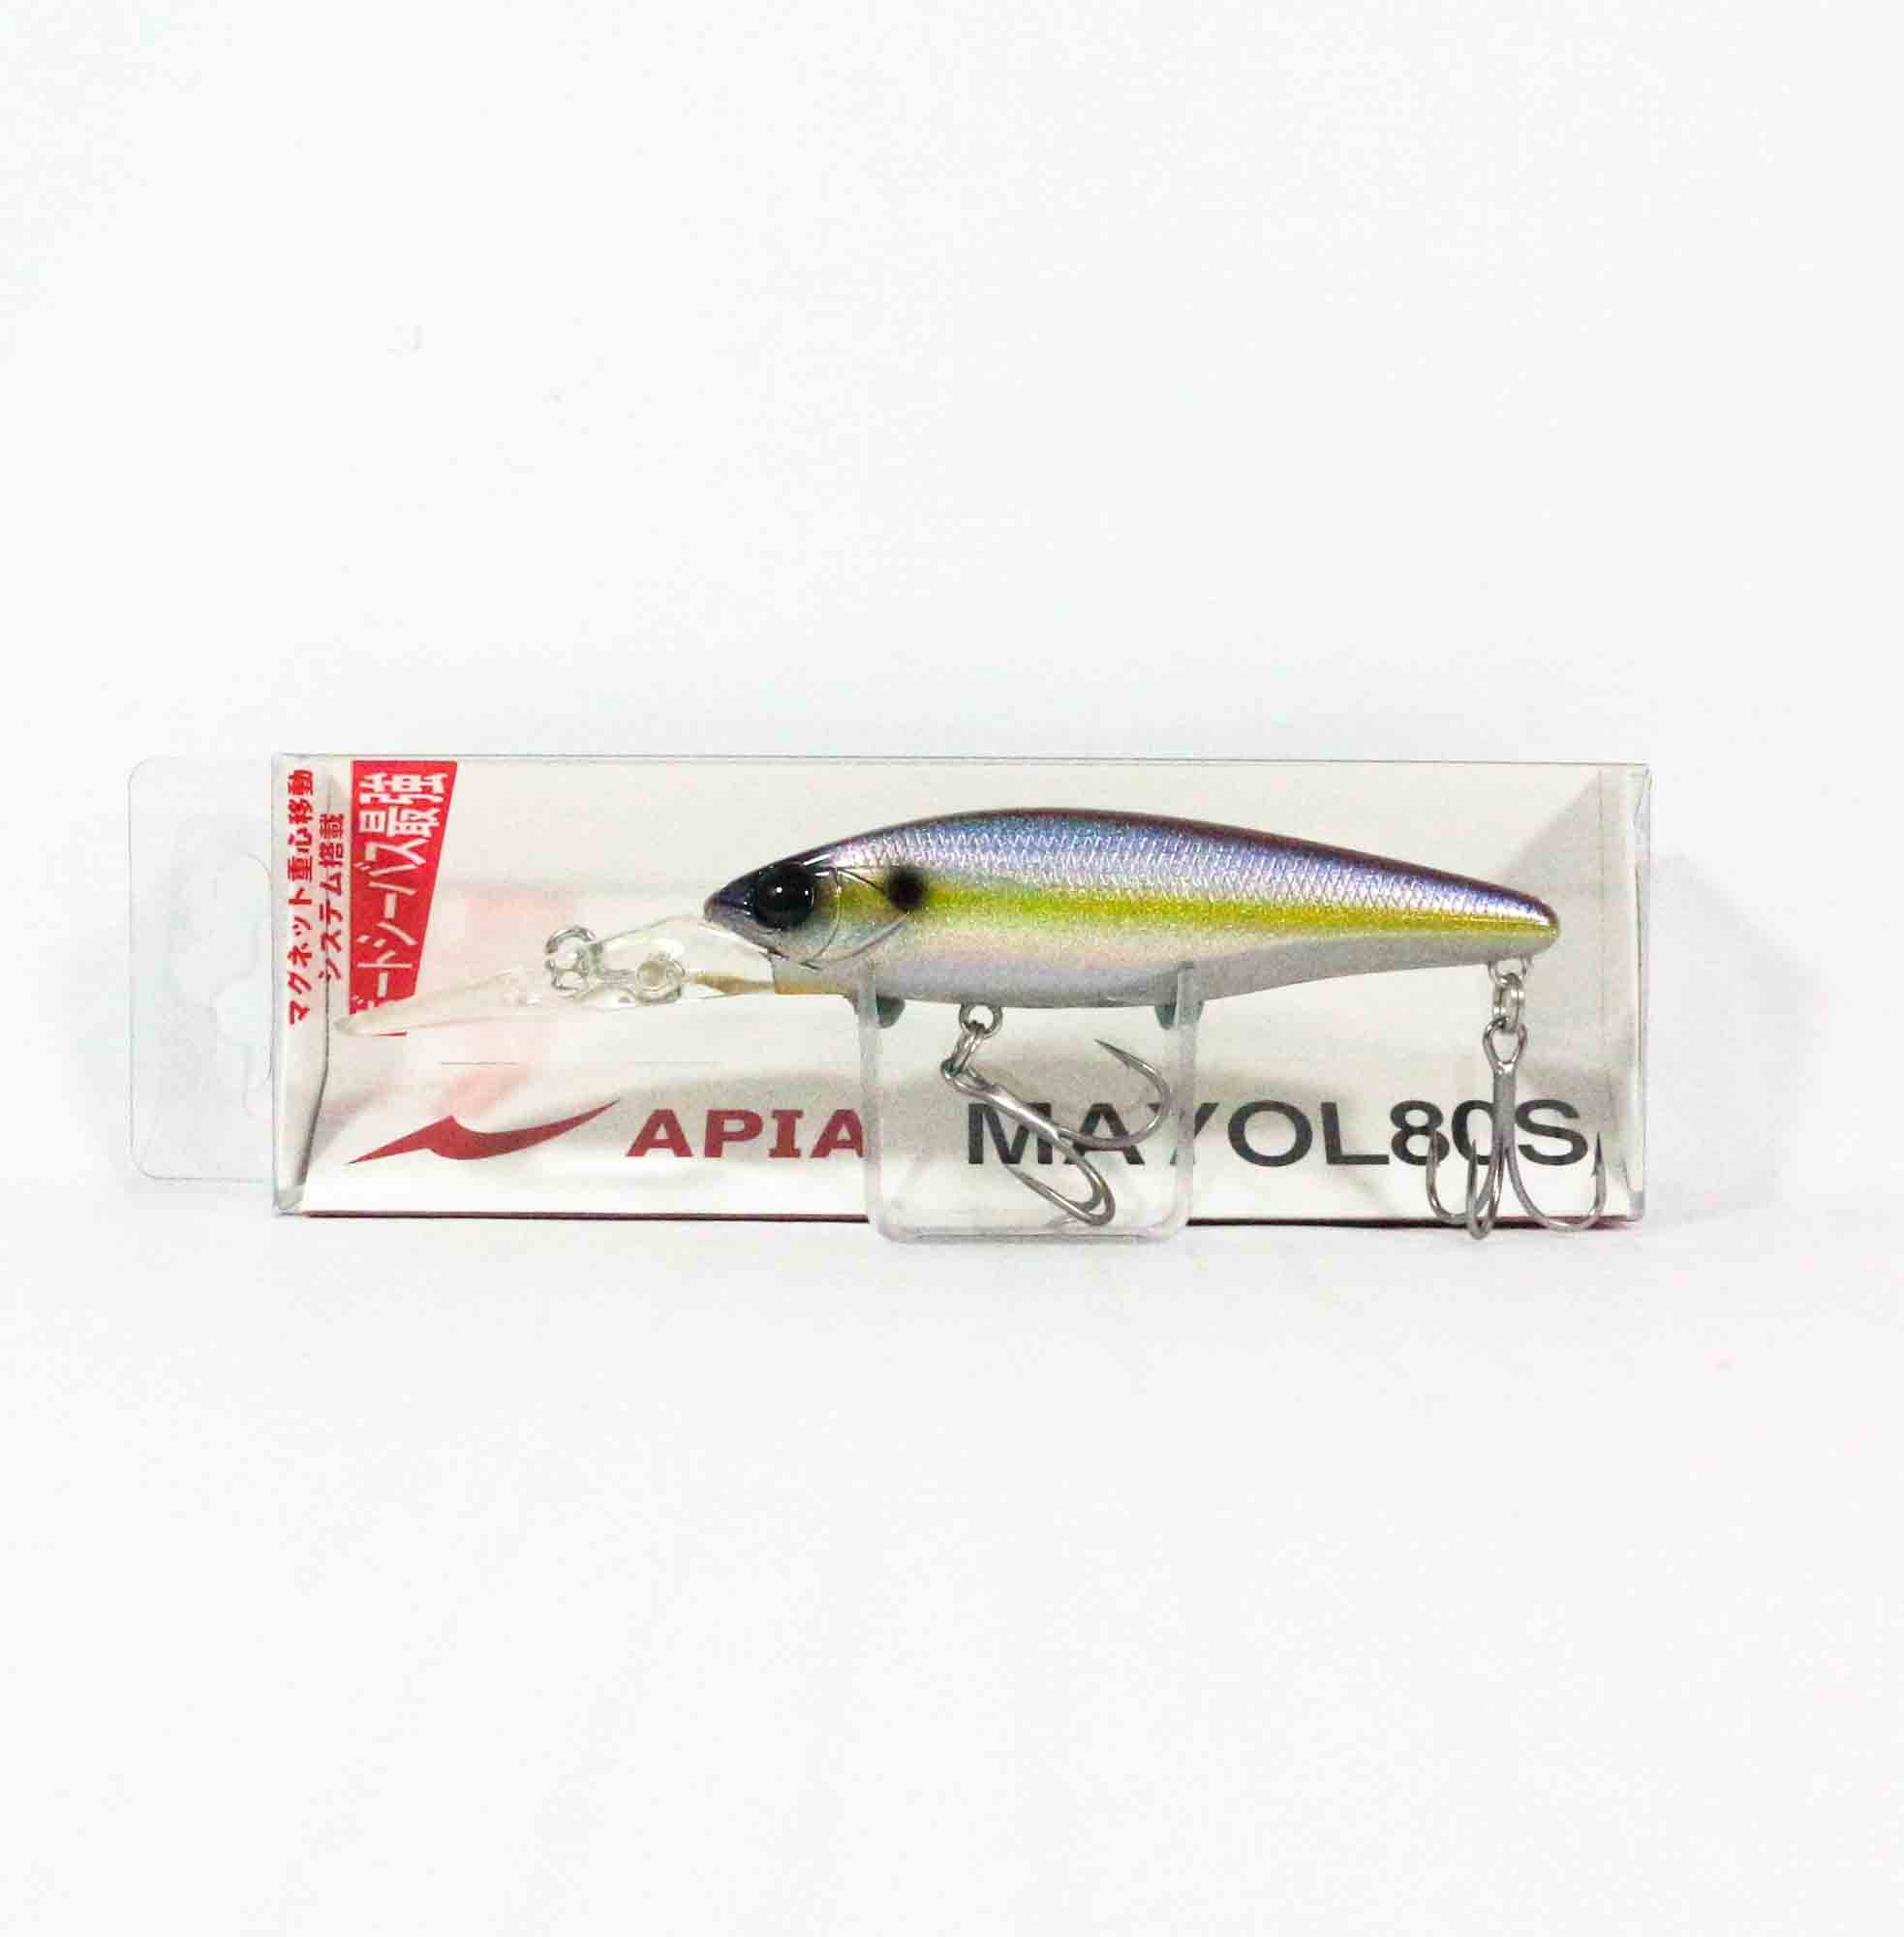 Apia Mayol 80S Sinking Lure 01 (1075)